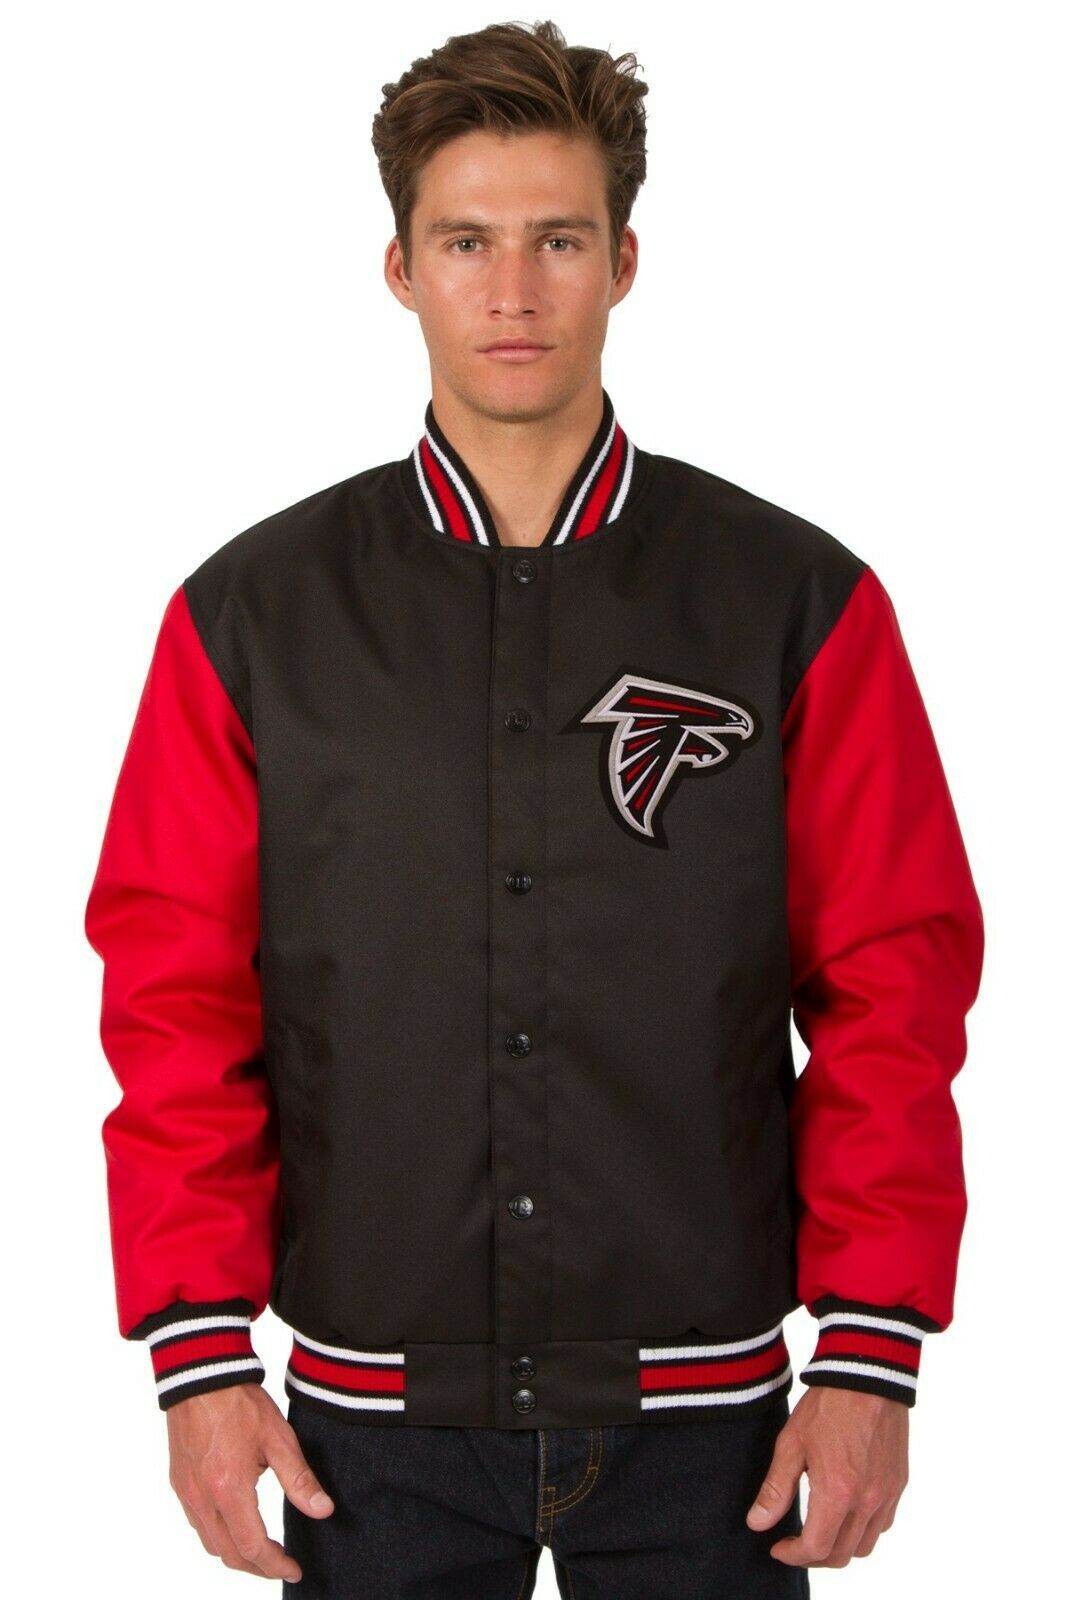 NFL Atlanta Falcons Poly Twill Jacket Black Red Patch Logo JH Design - $99.99